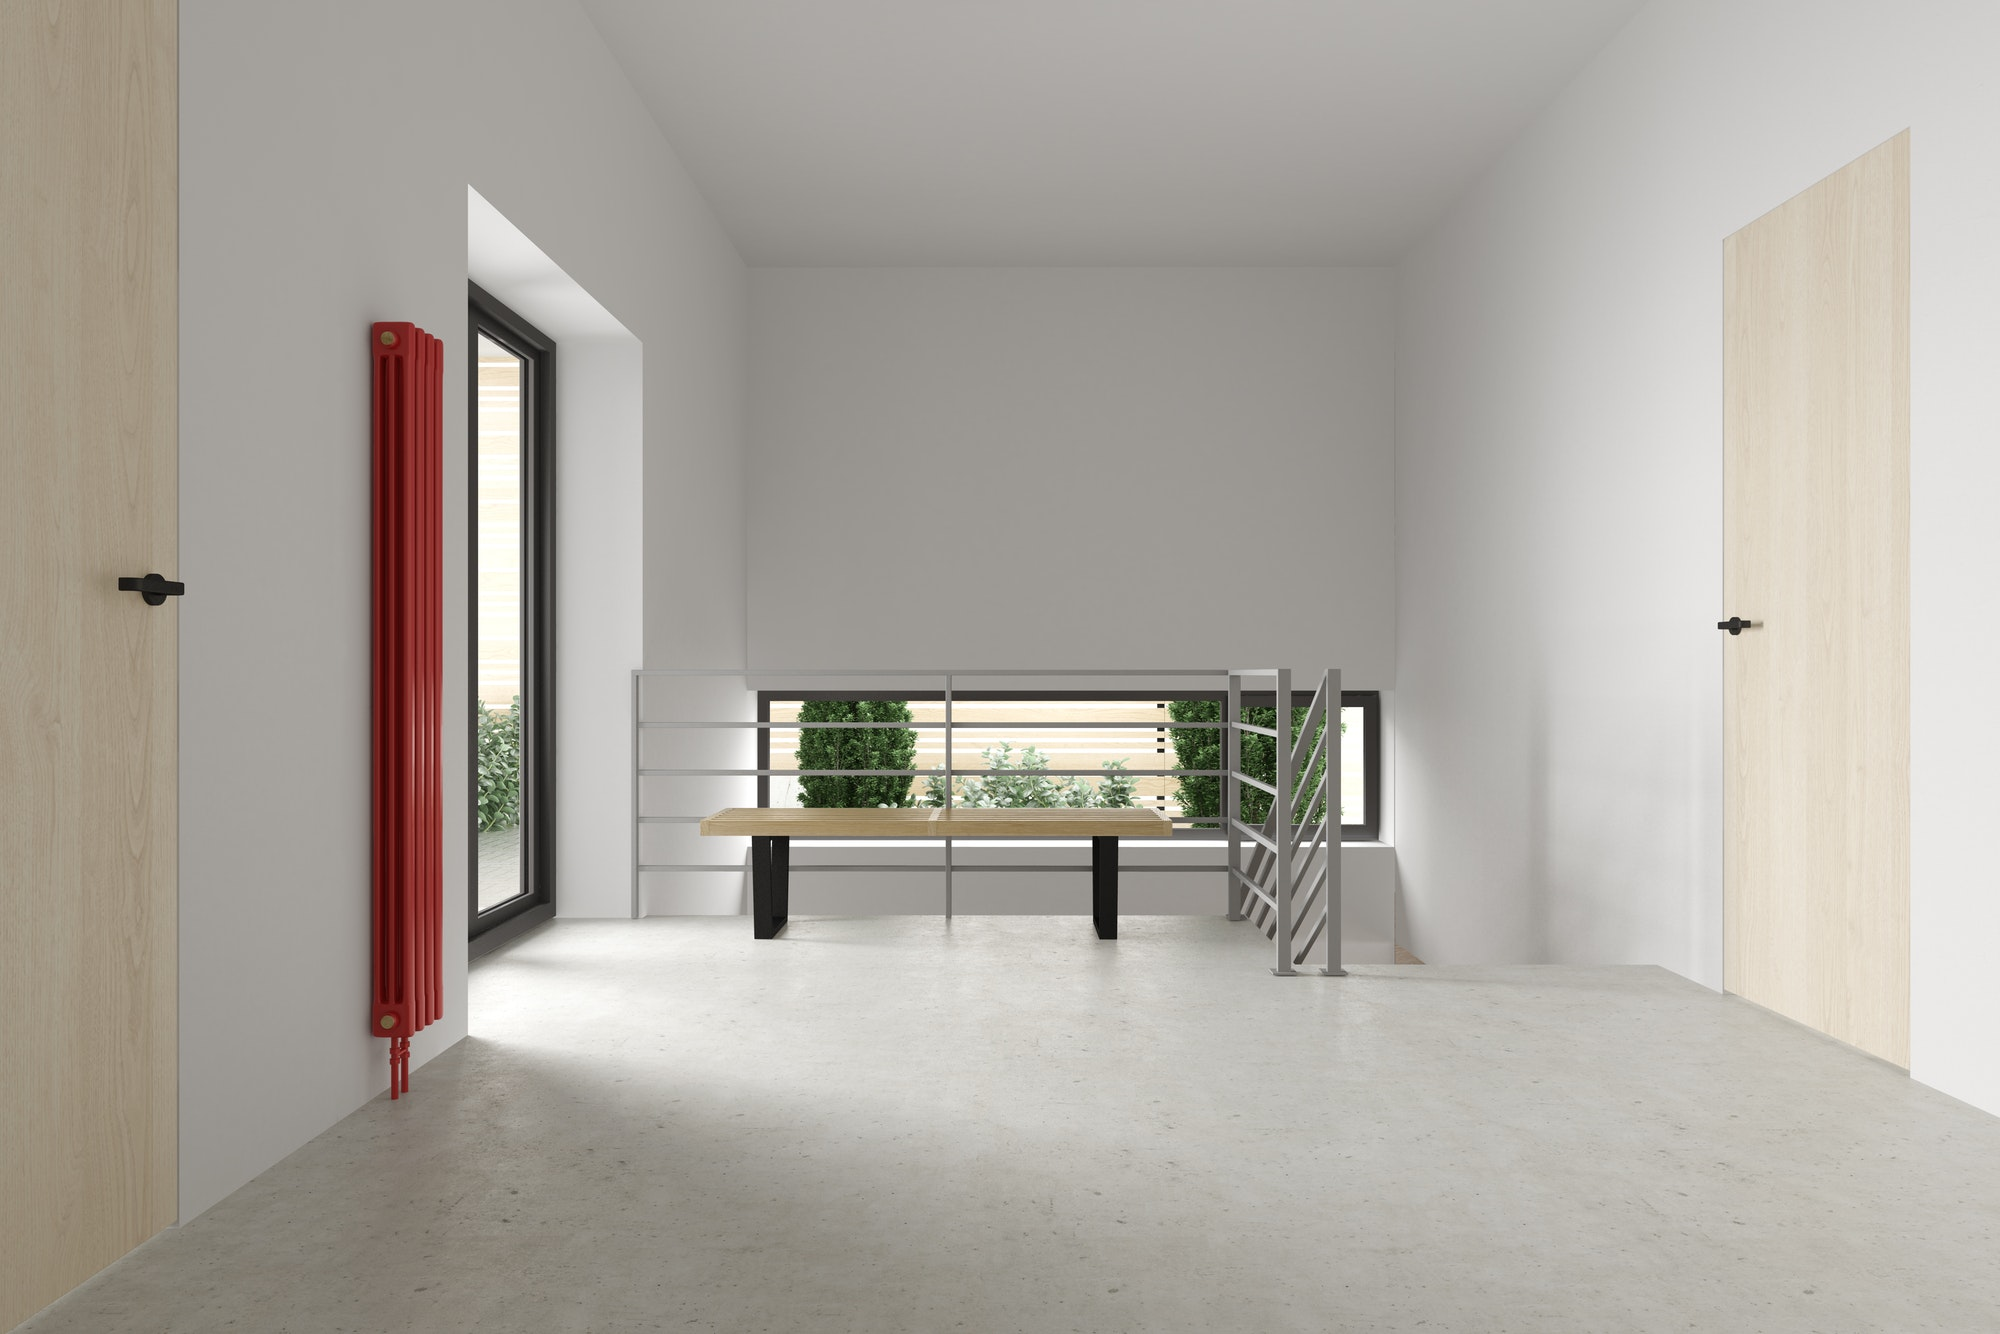 Modern apartment, entrance door 3D illustration